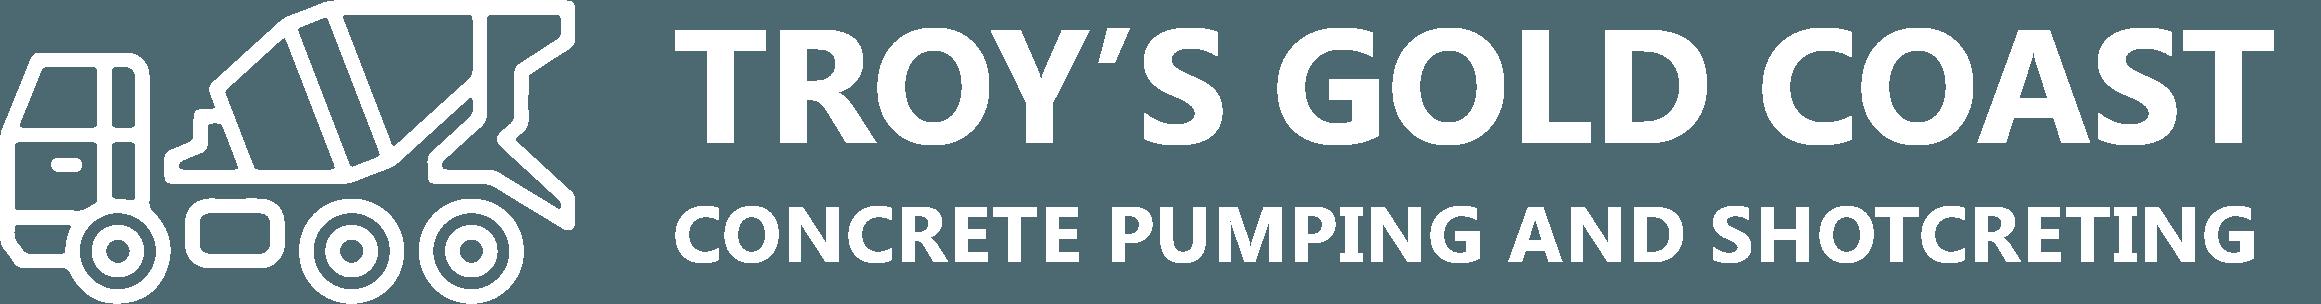 troys concrete pumping logo